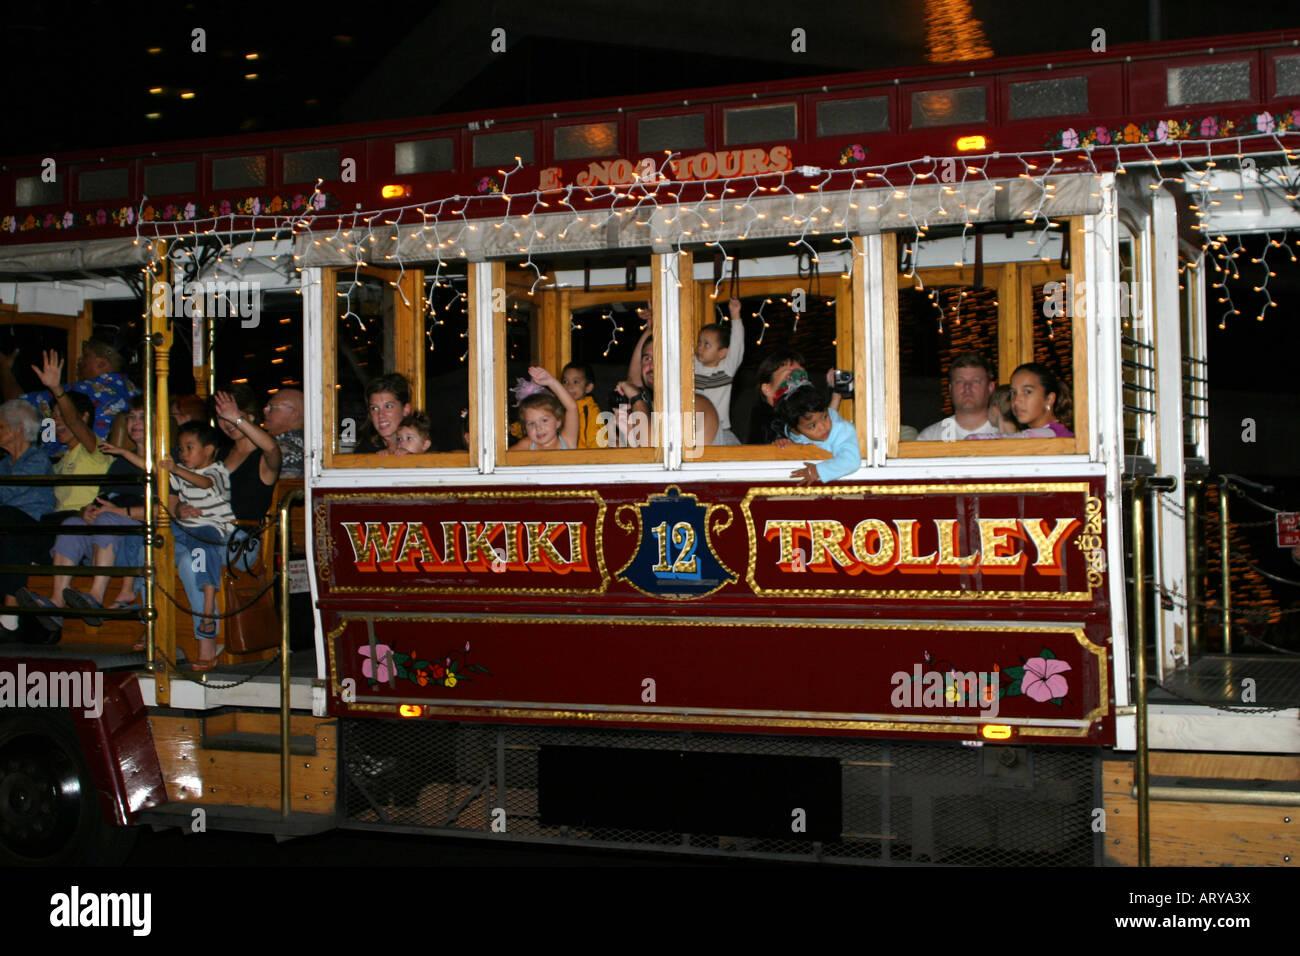 Honolulu Christmas Trolley 2021 Waikiki Trolley High Resolution Stock Photography And Images Alamy